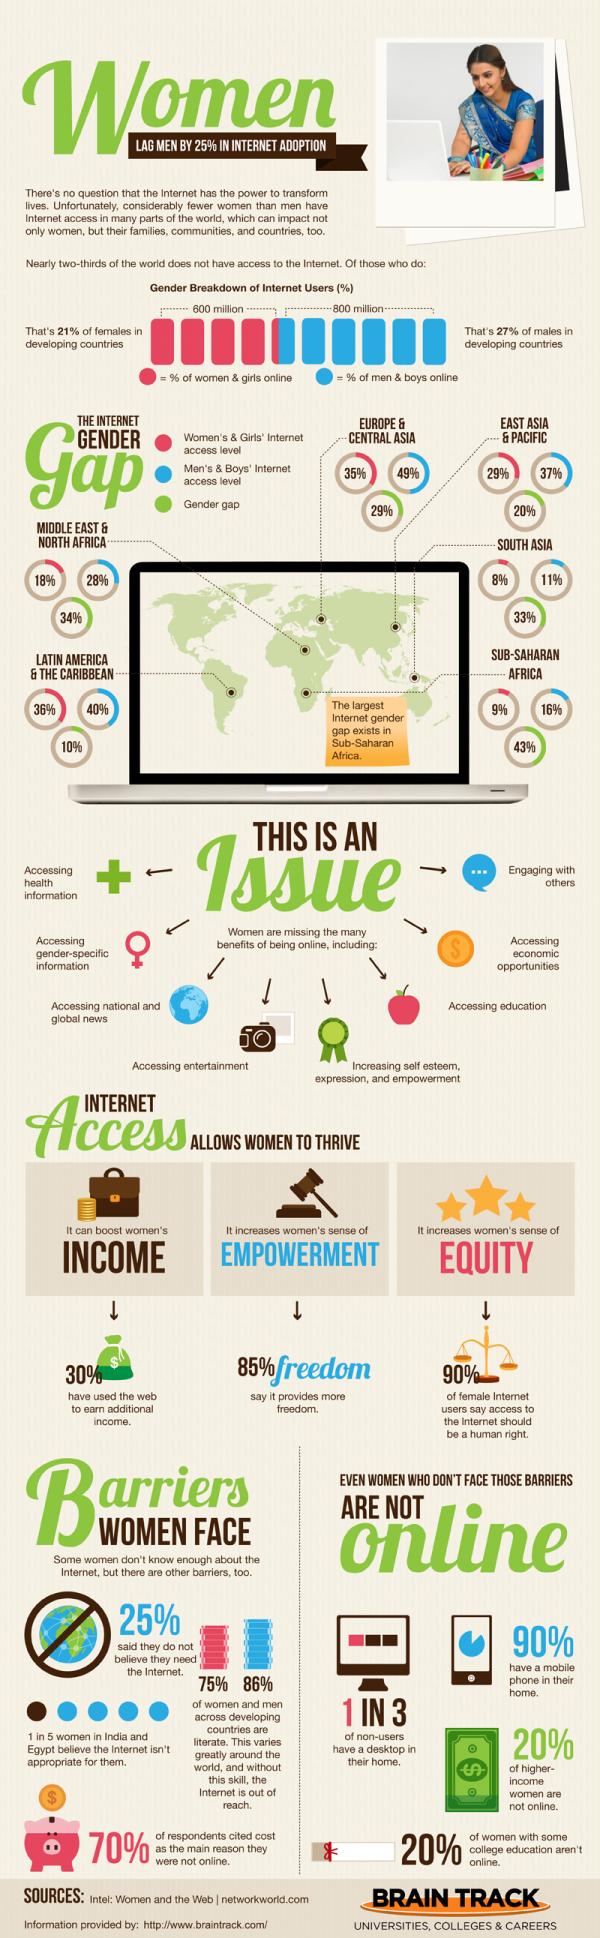 The international gender gap in internet adoption [infographic]